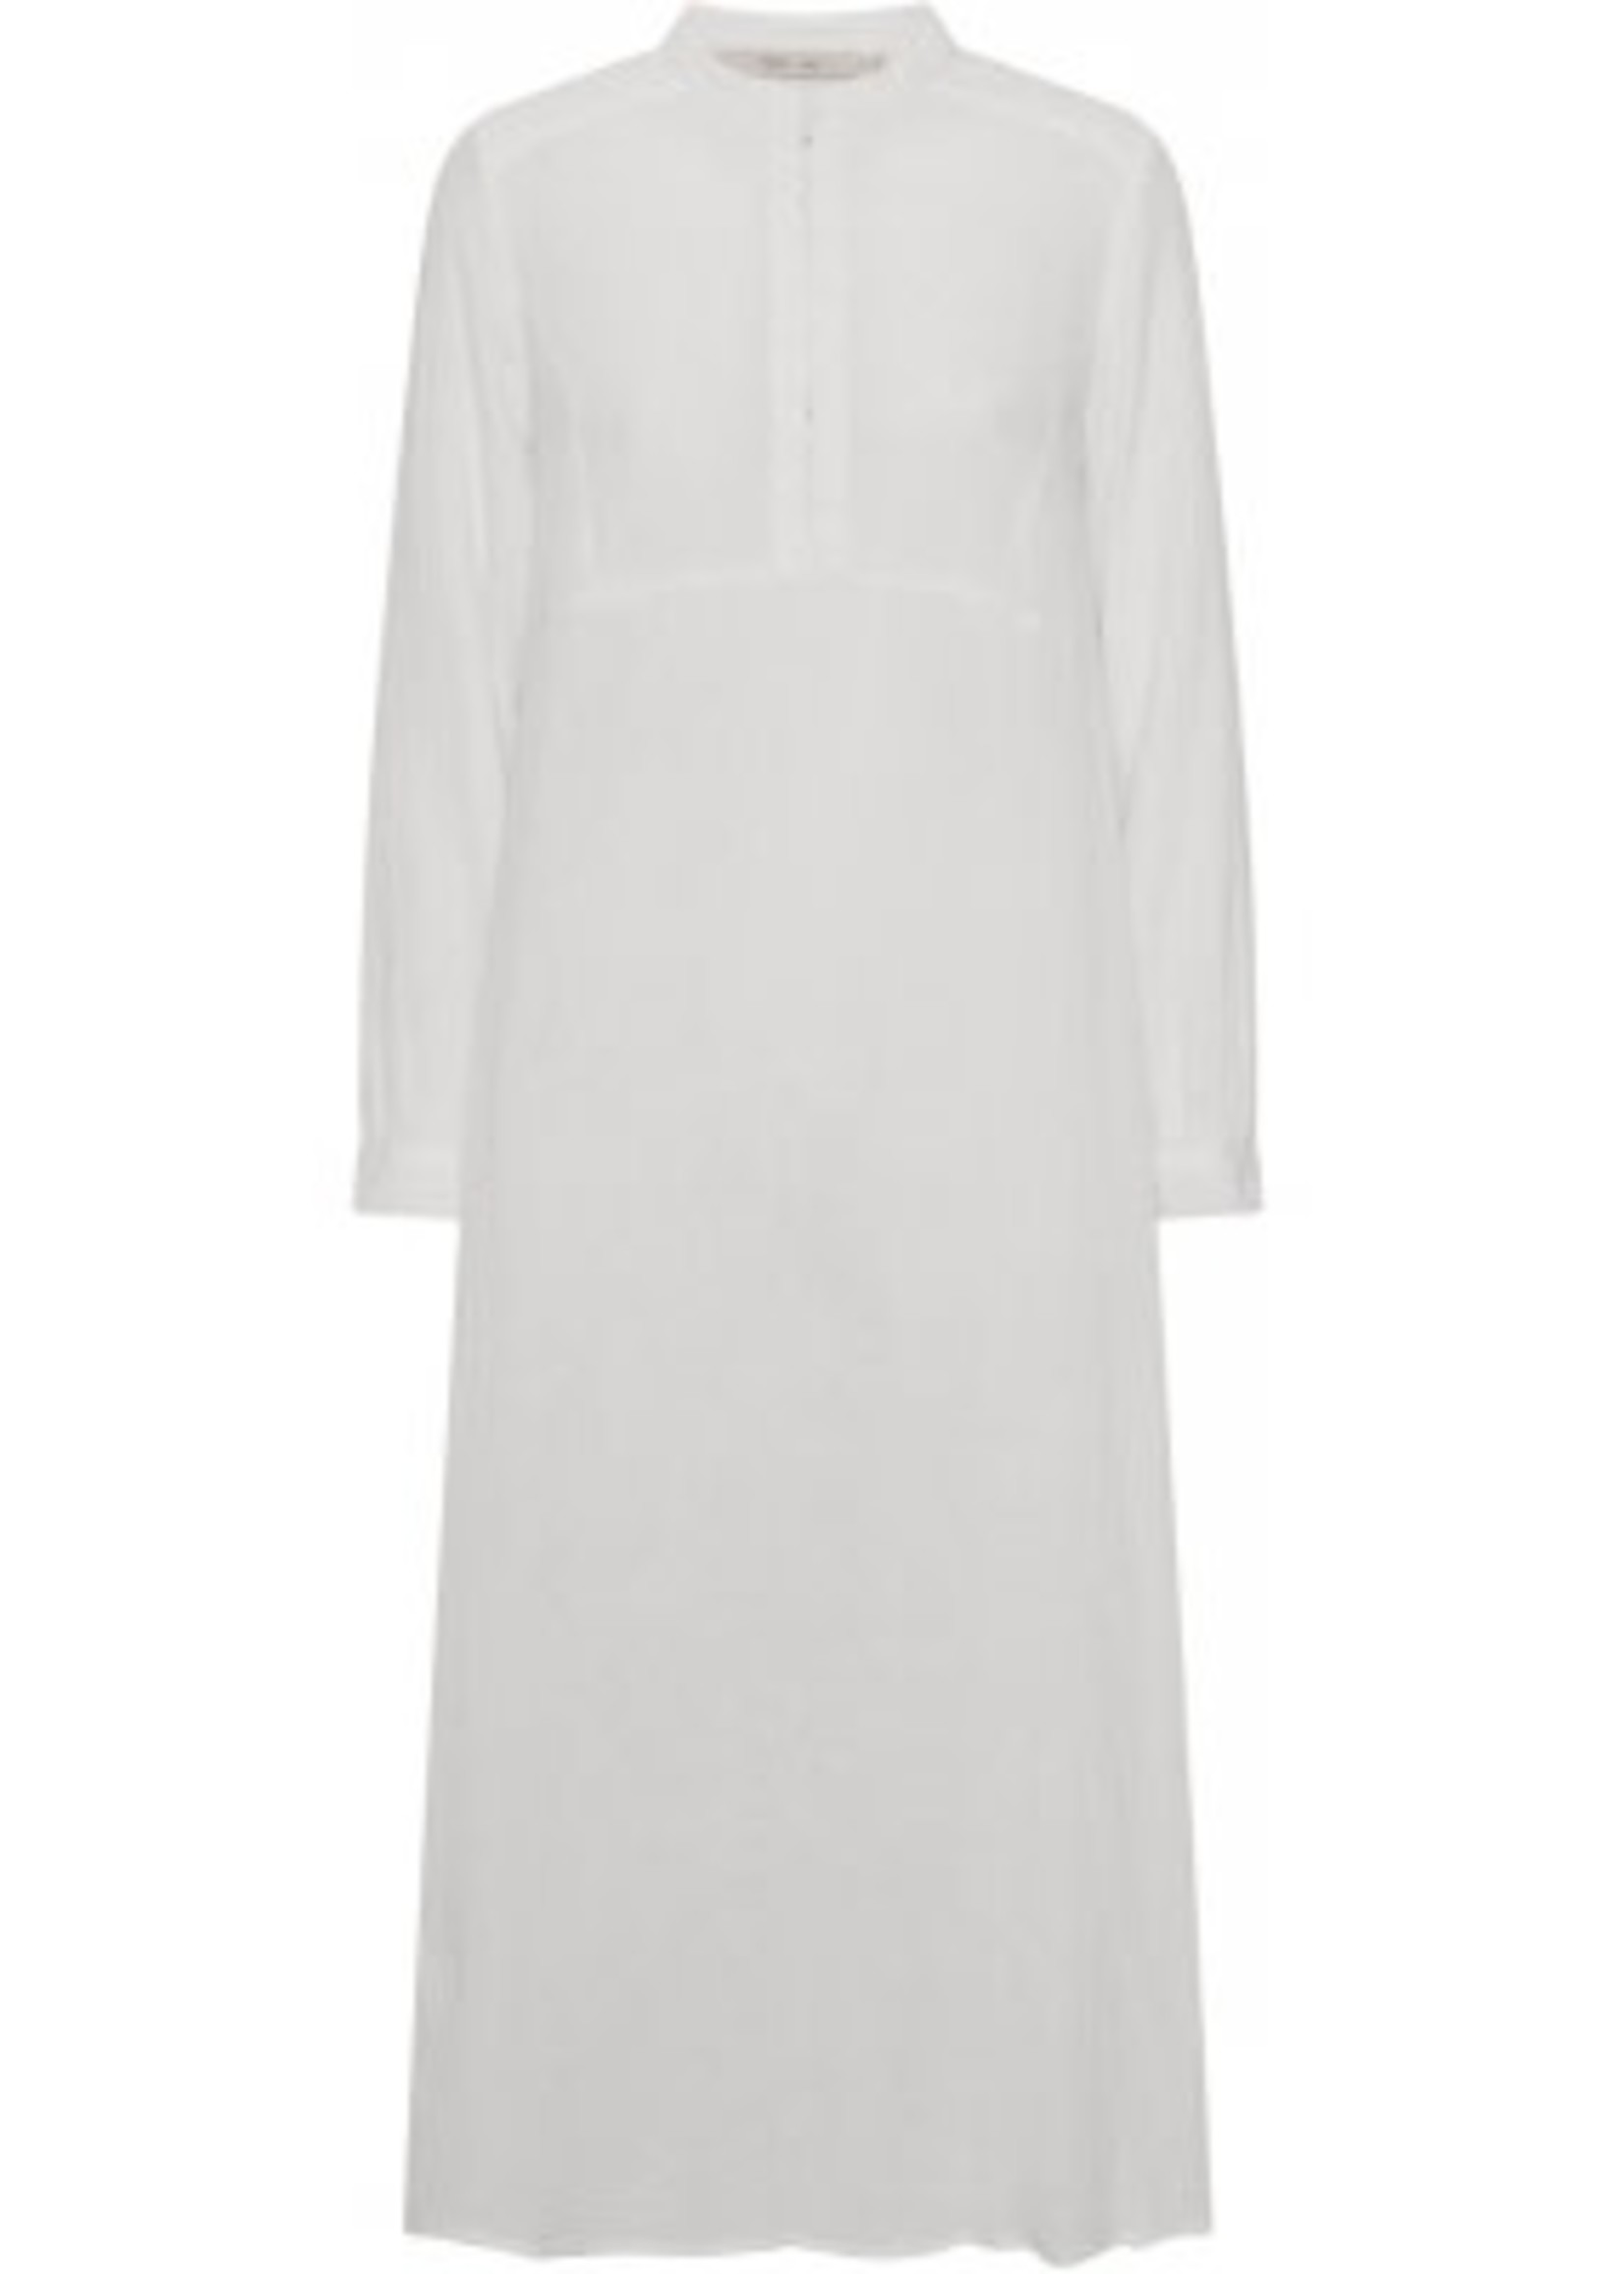 COSTAMANI Khan dress white